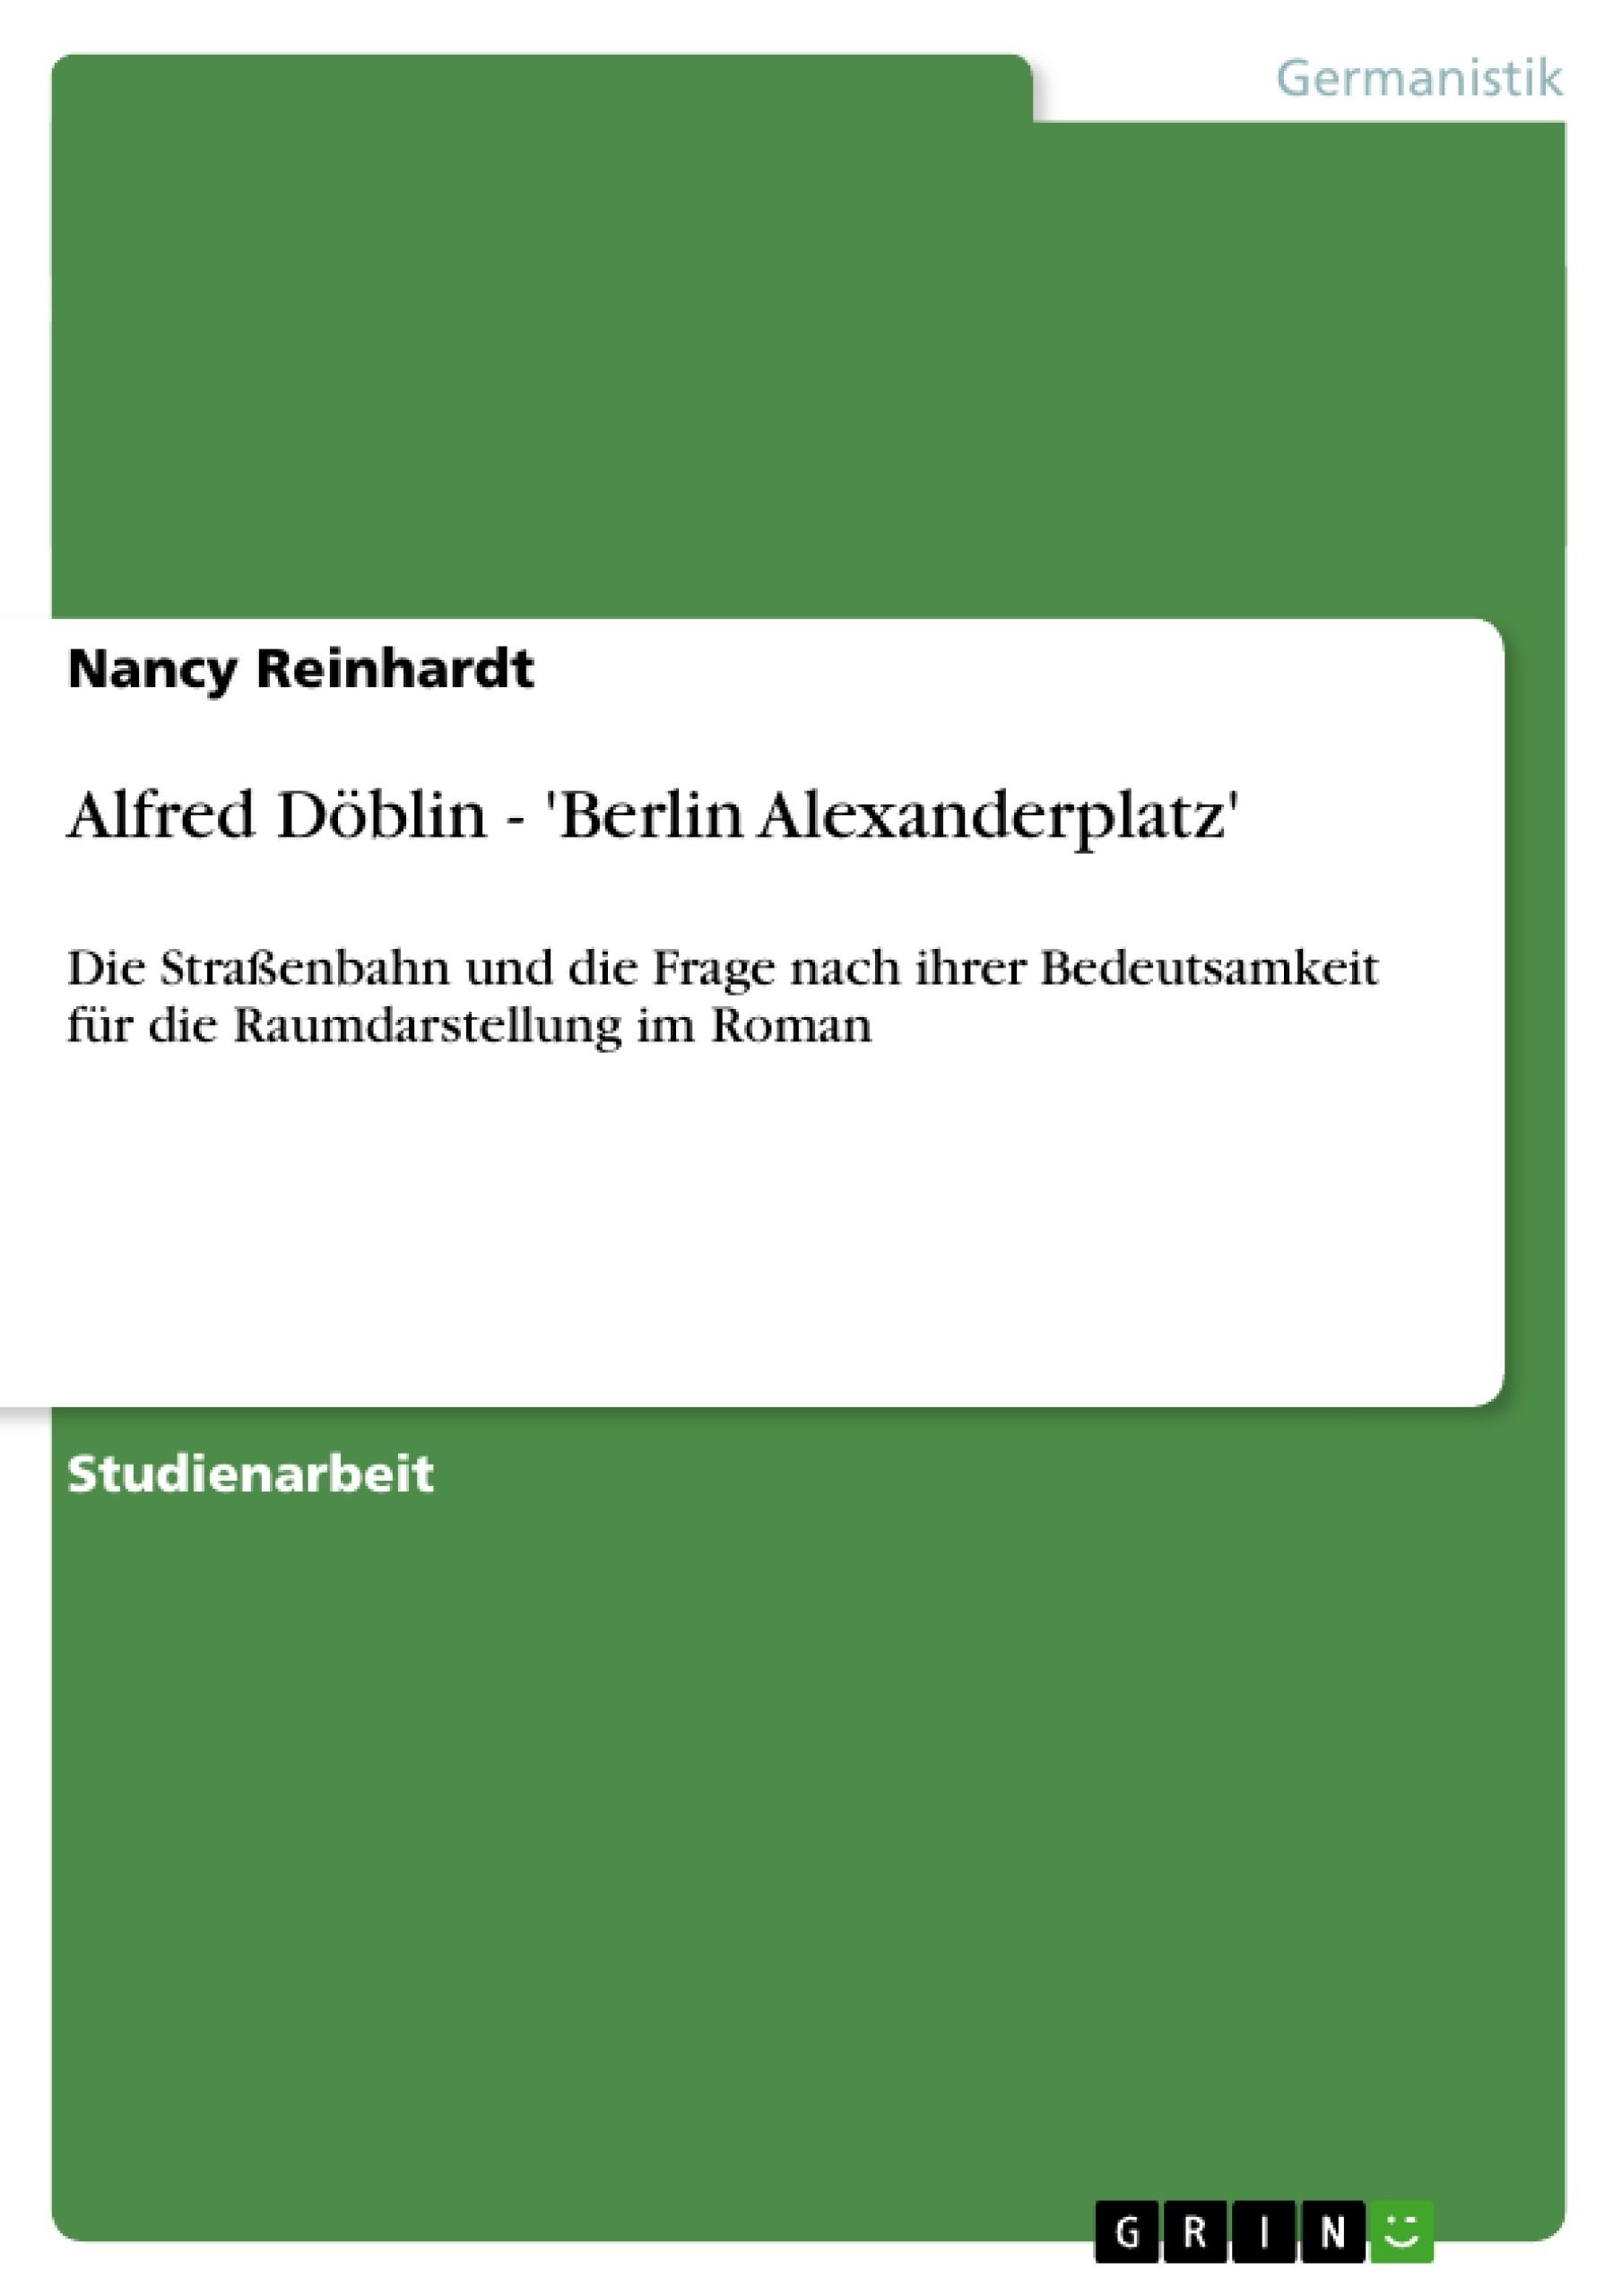 Titel: Alfred Döblin - 'Berlin Alexanderplatz'